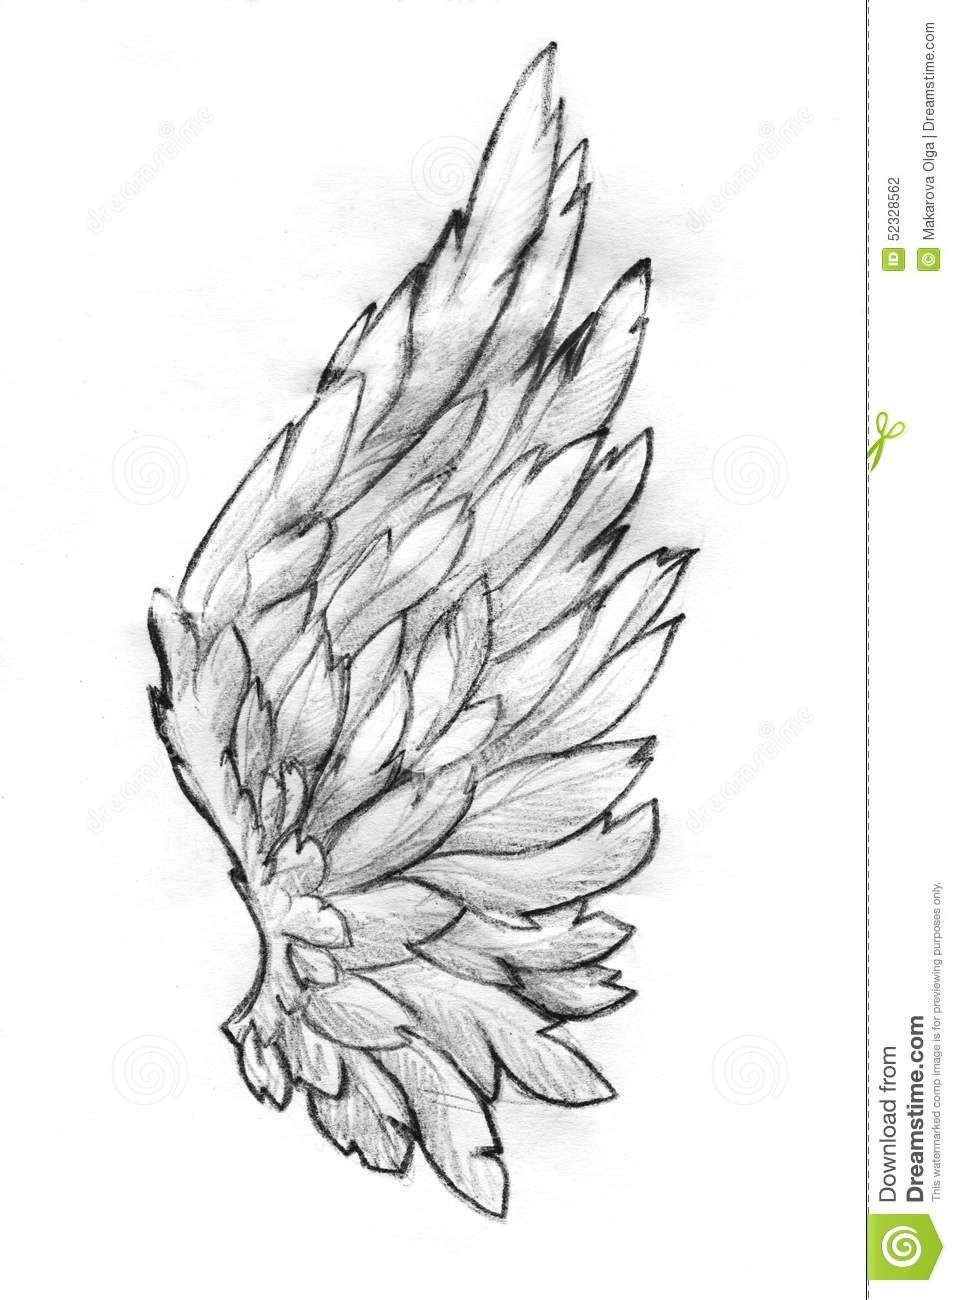 Resultado de imagen para dibujos a lapiz | Elegant | Pinterest ...